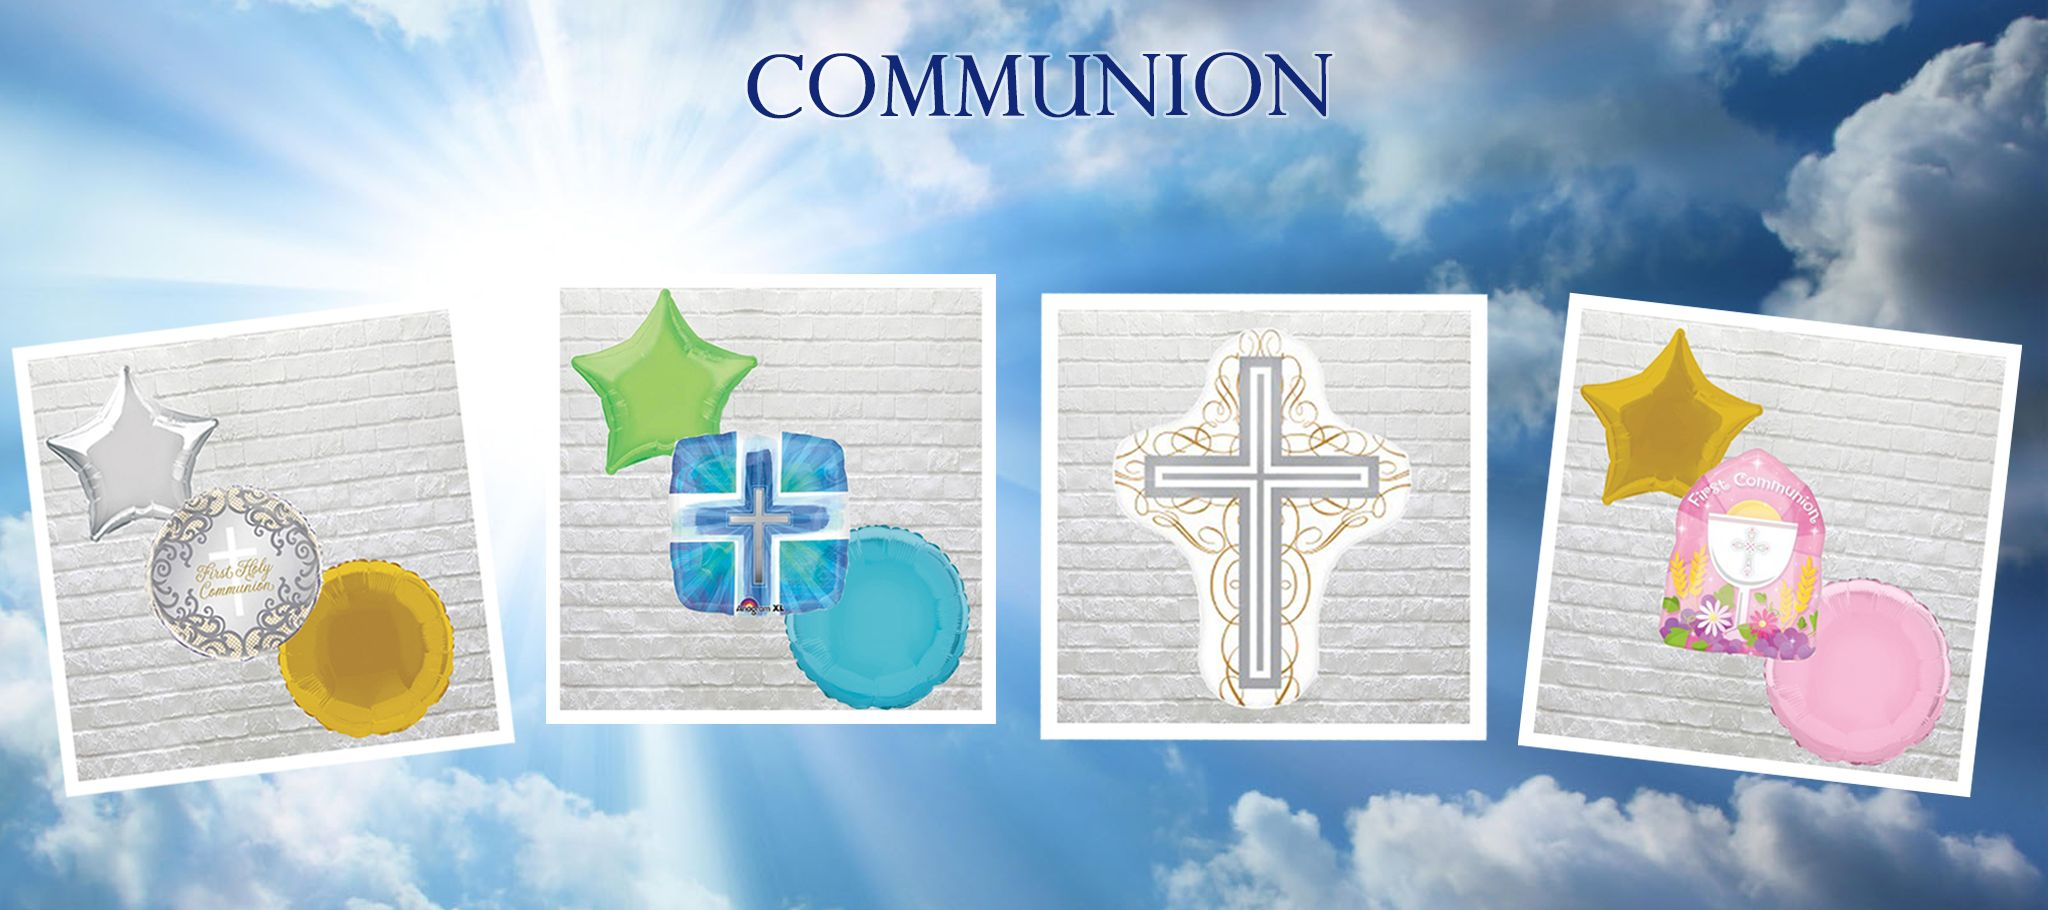 Communion 01